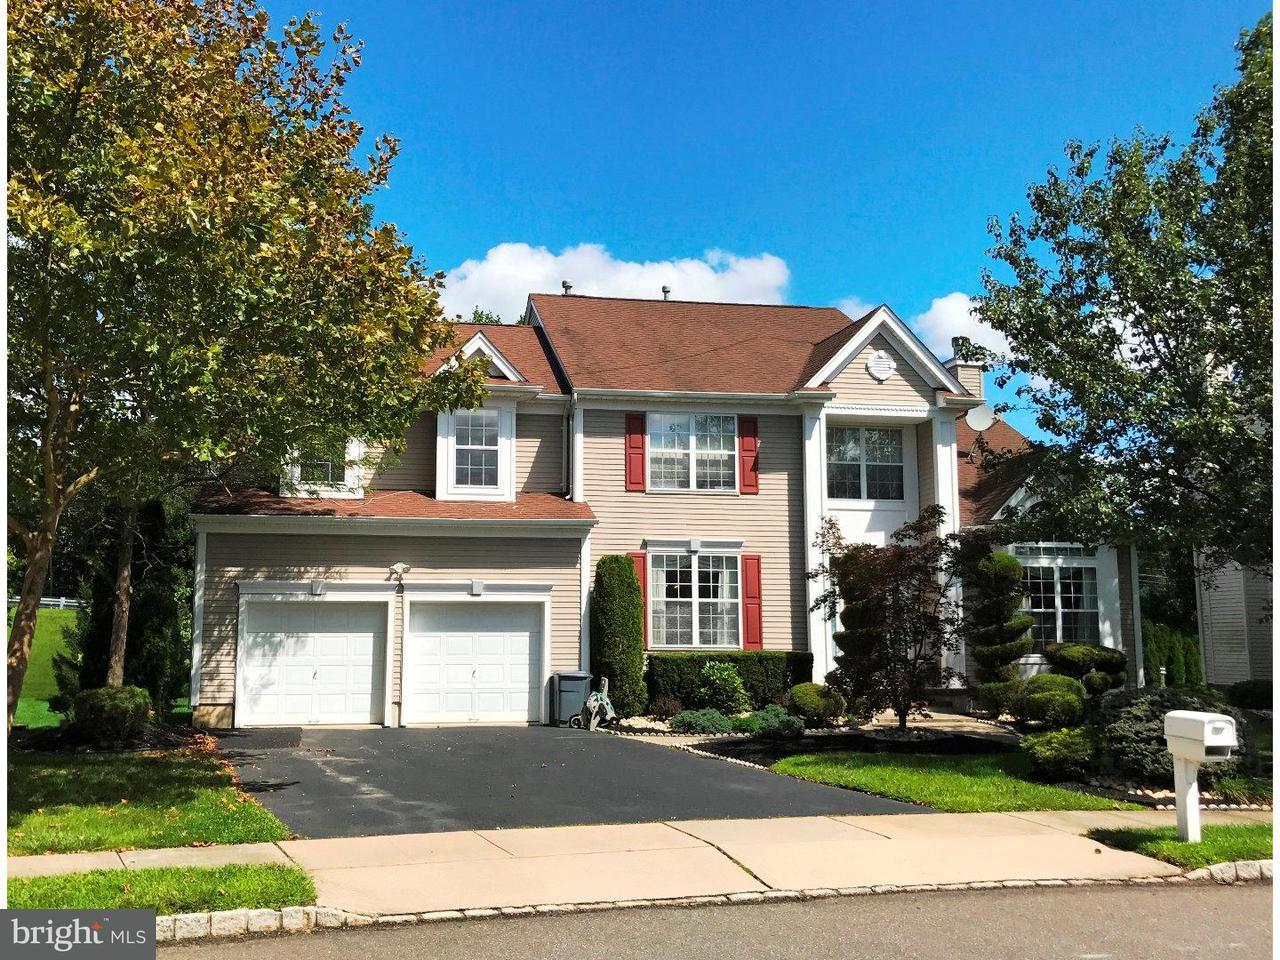 Single Family Home for Rent at 5 KELLY WAY South Brunswick, New Jersey 08852 United StatesMunicipality: South Brunswick Township